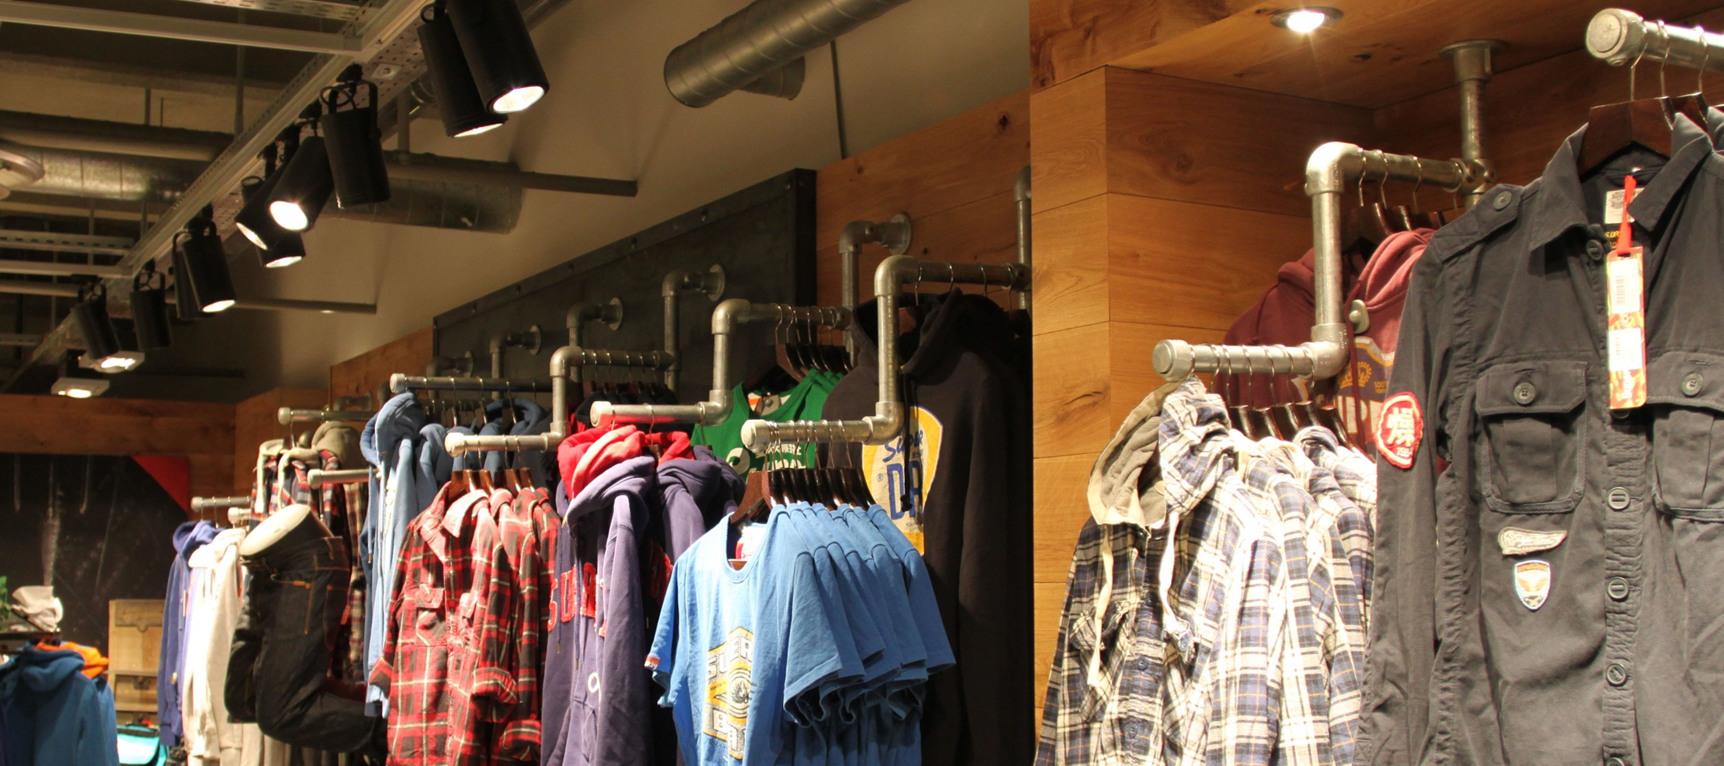 Display Clothing Racks